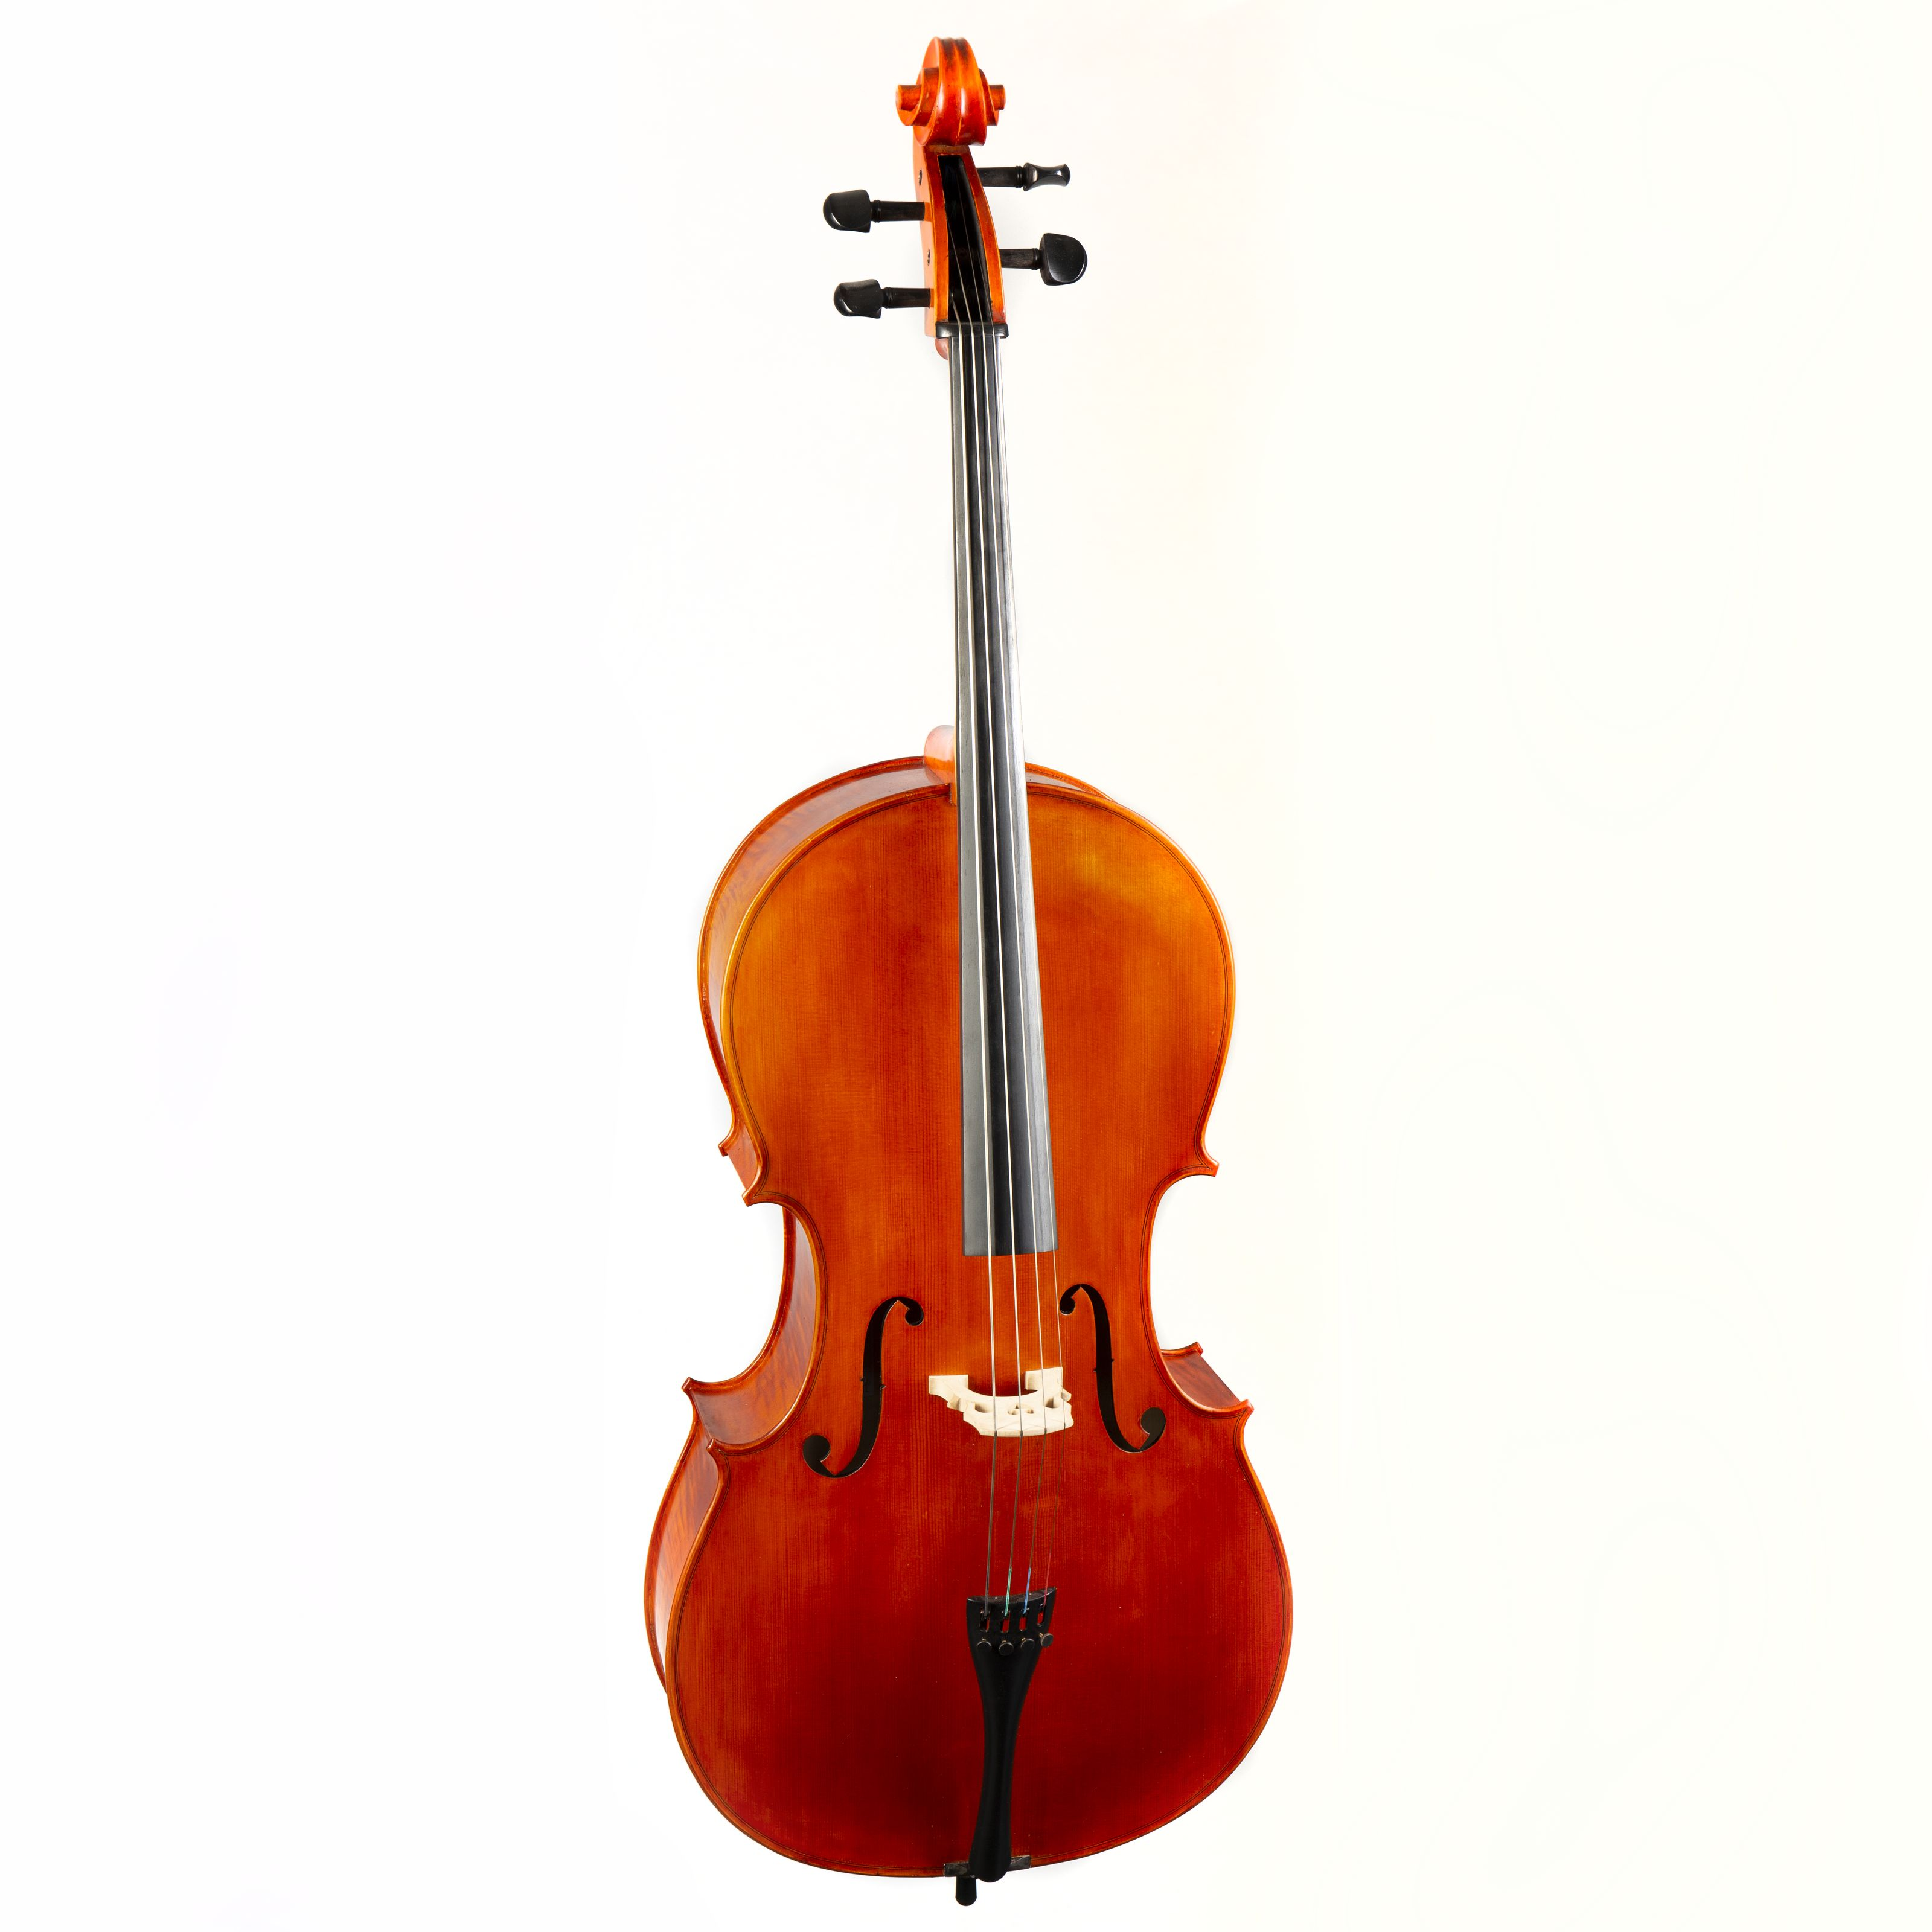 Eastman - Westbury Cello 4/4 CI027 4/4